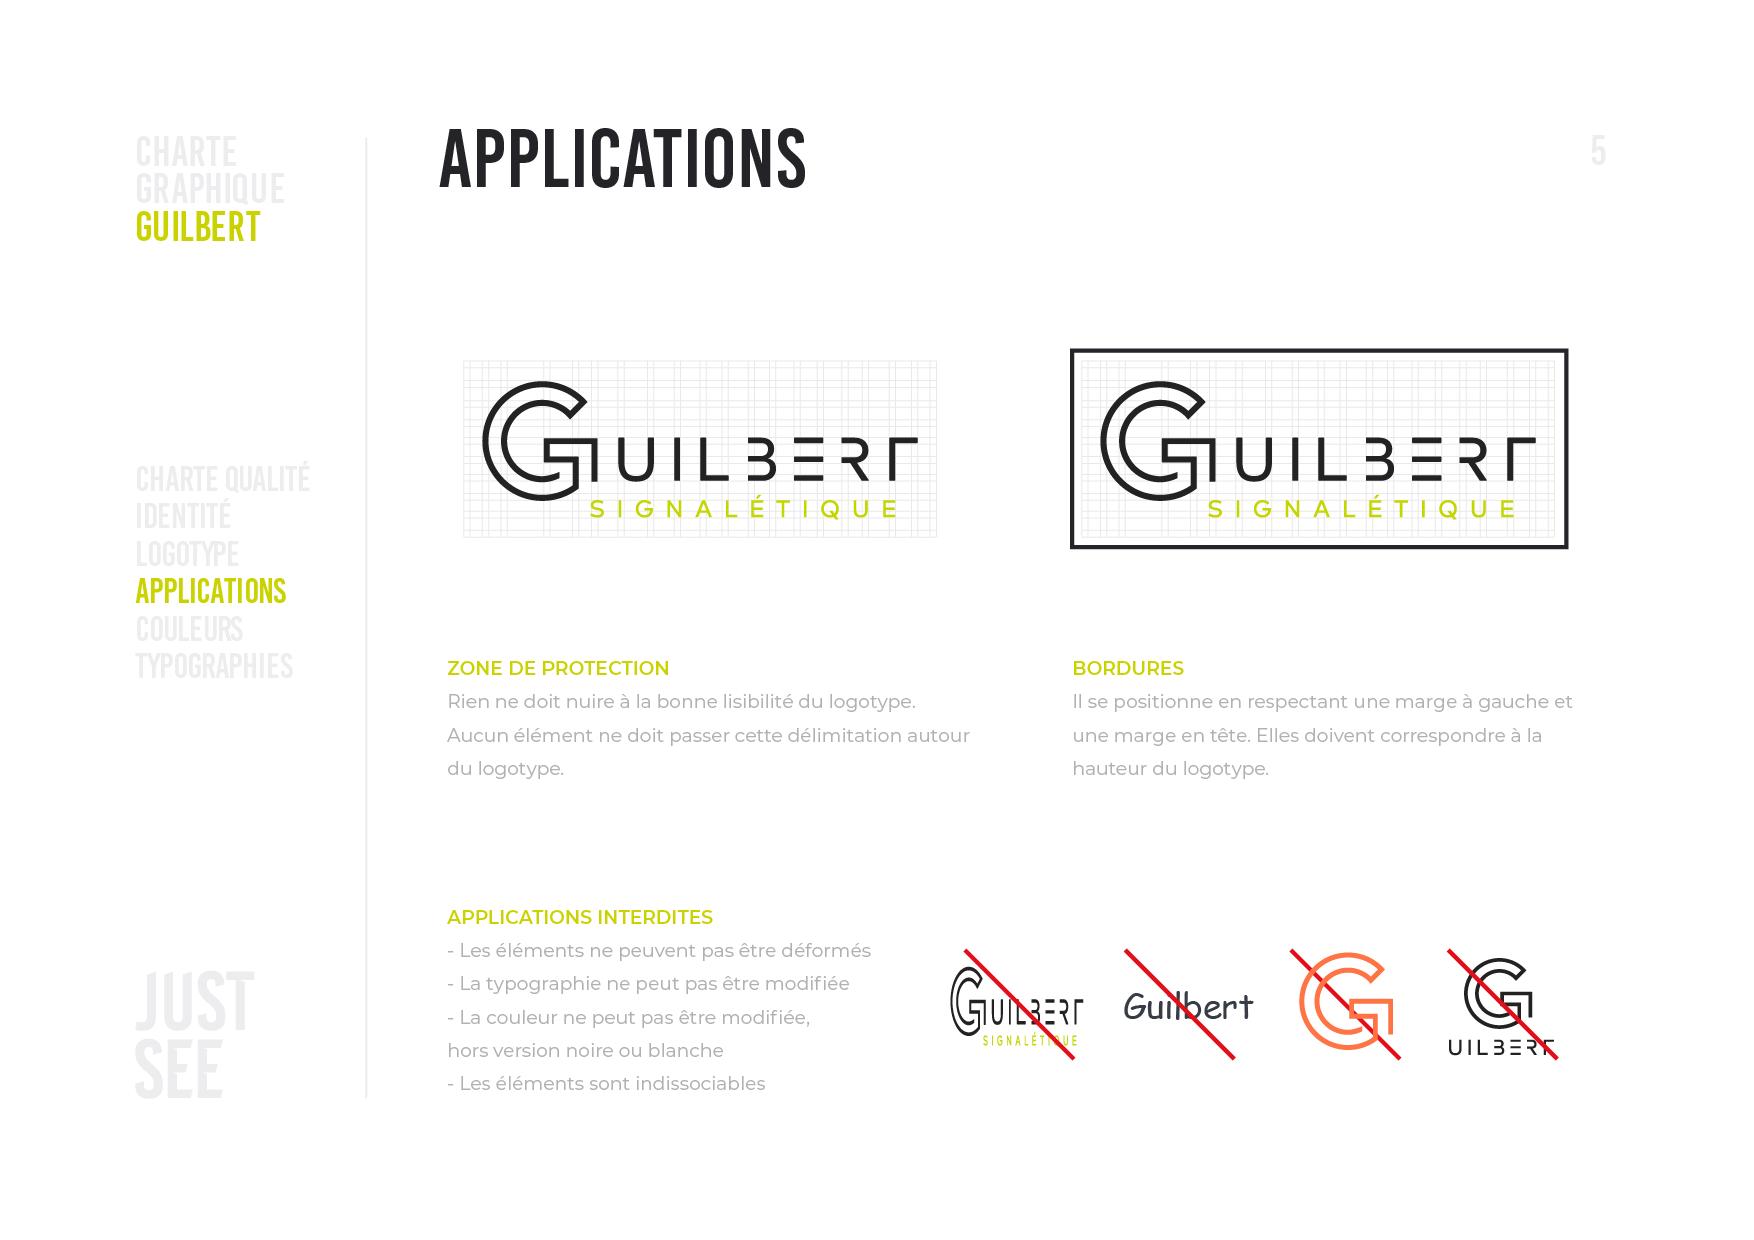 Guilbert Charte graphique 2020-06